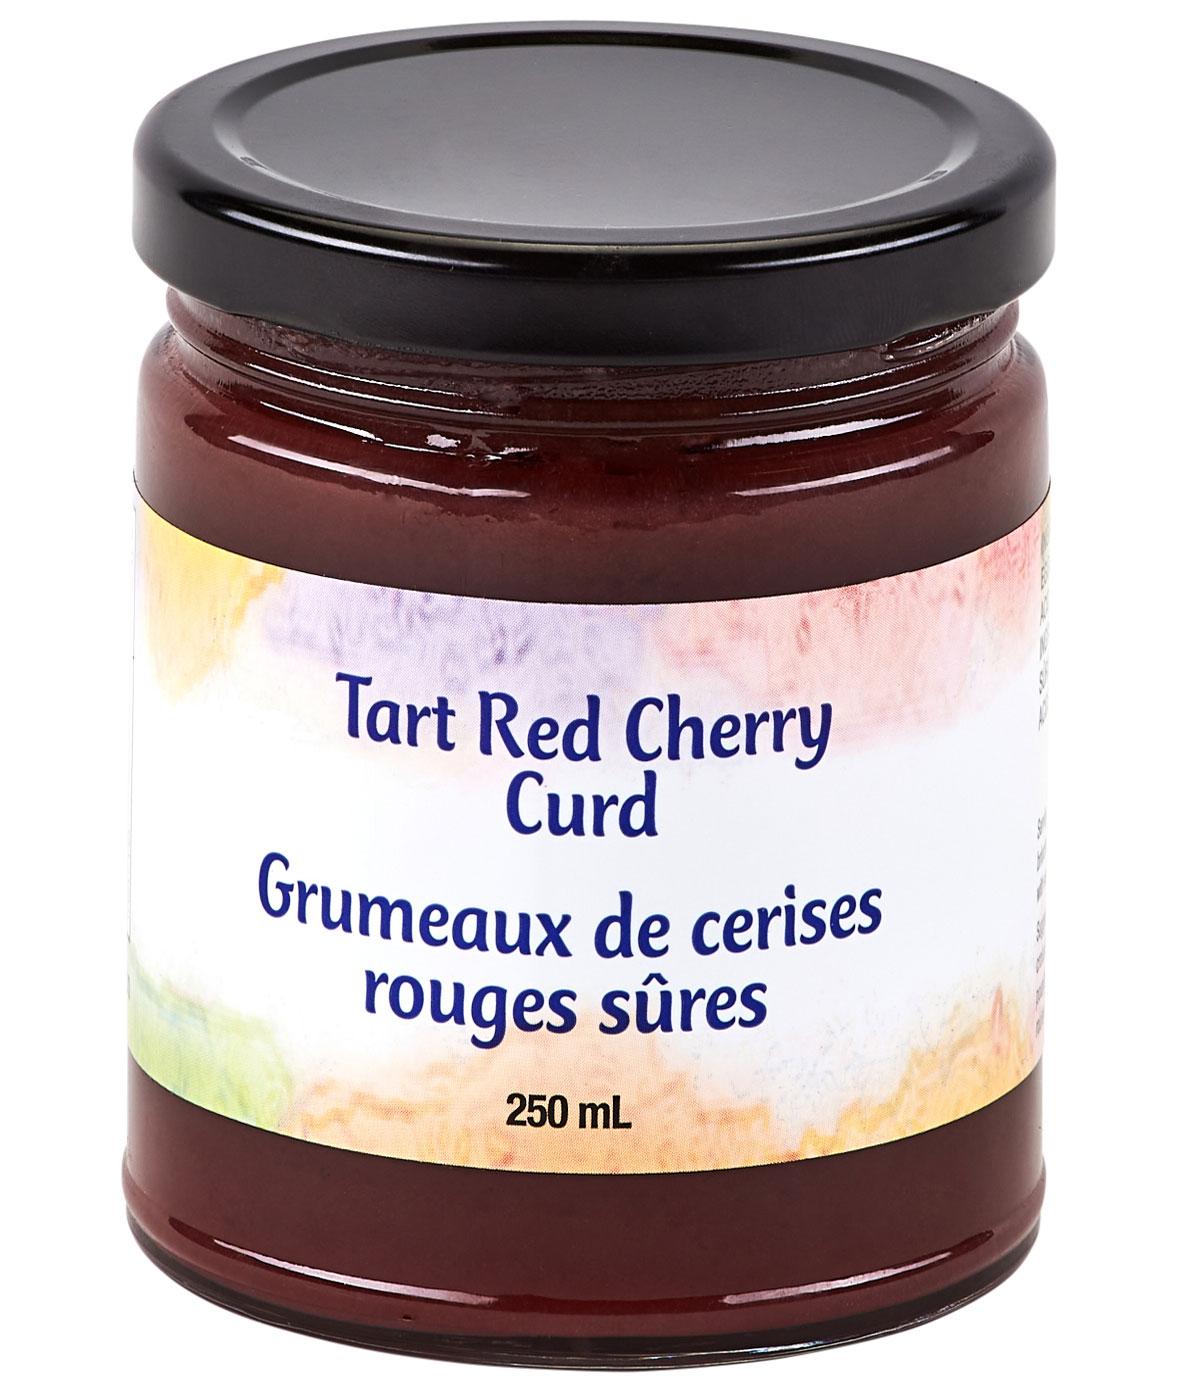 tart red cherry curd